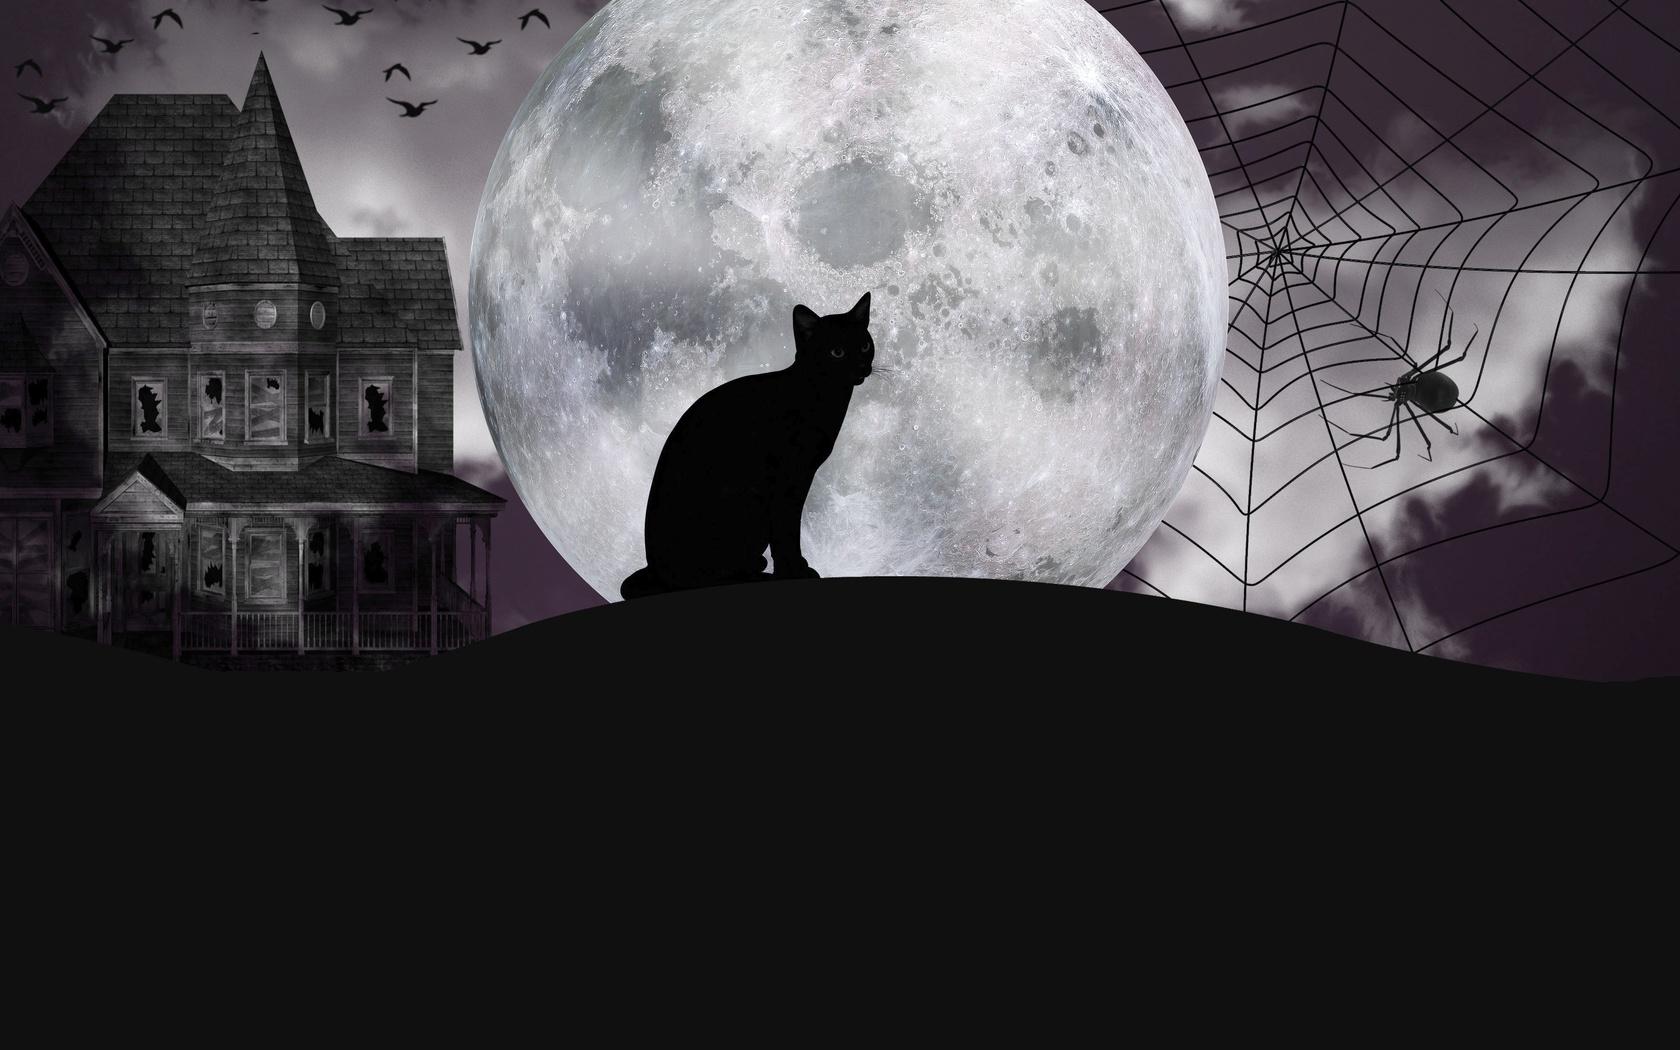 кошка, силуэт, паук, замок, луна, монохромная